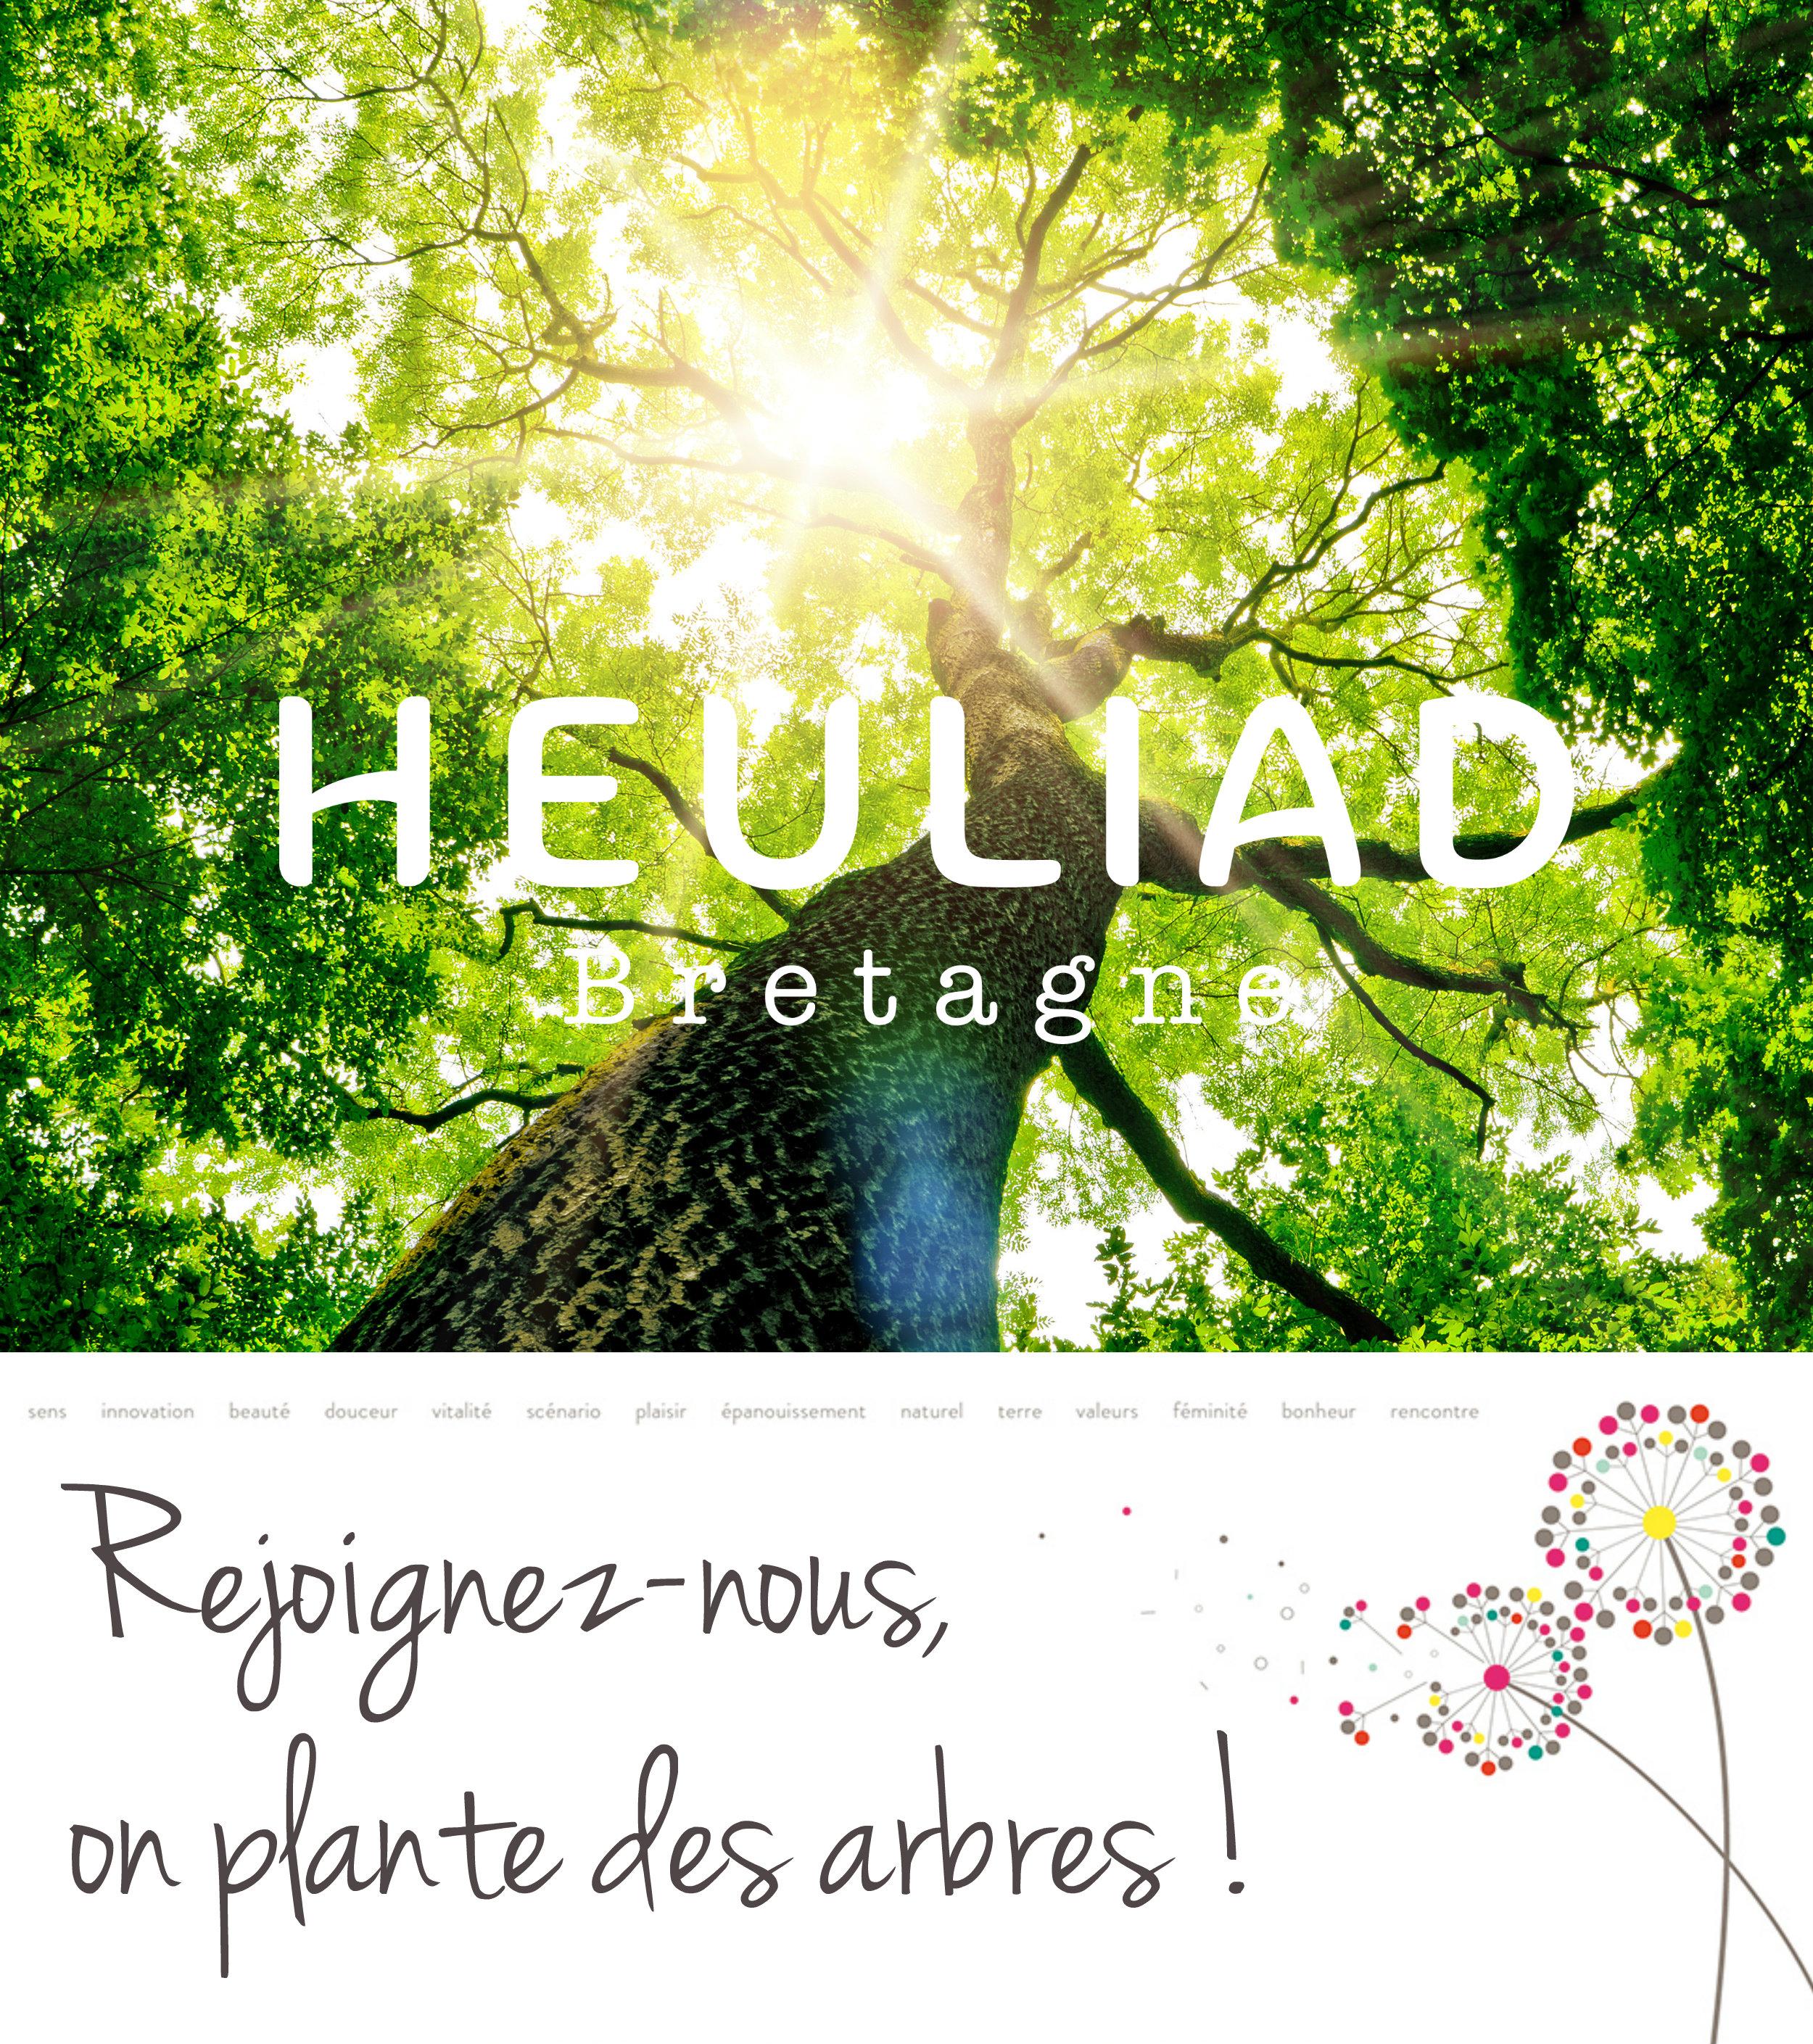 La forêt heuliad - reforestaction - crédit Fotolia